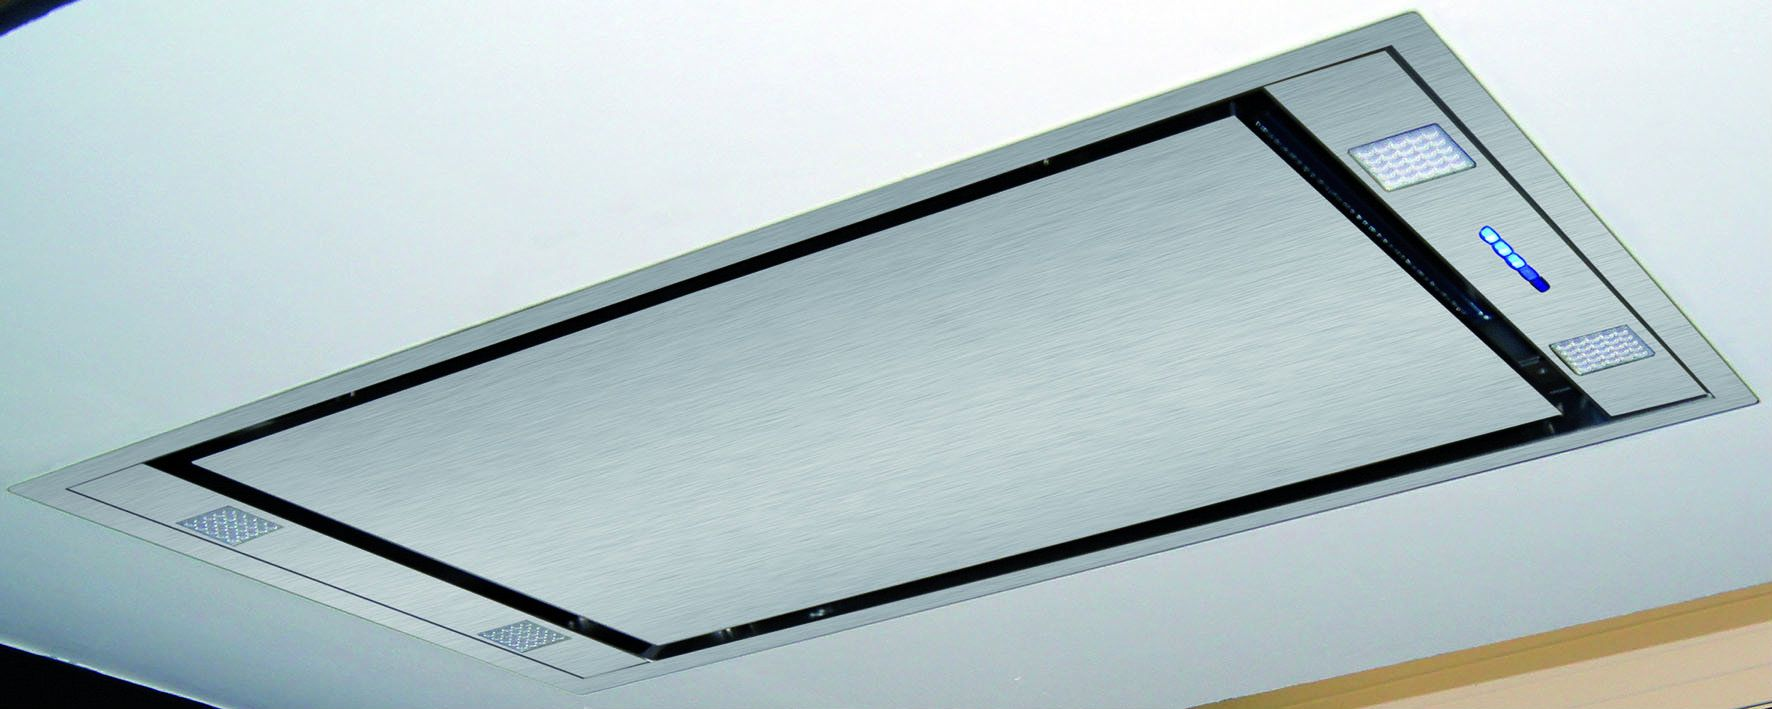 excelent in floor ceilings kitchen galley hood hoods range mounted ceiling whiteceiling remodels vent mount